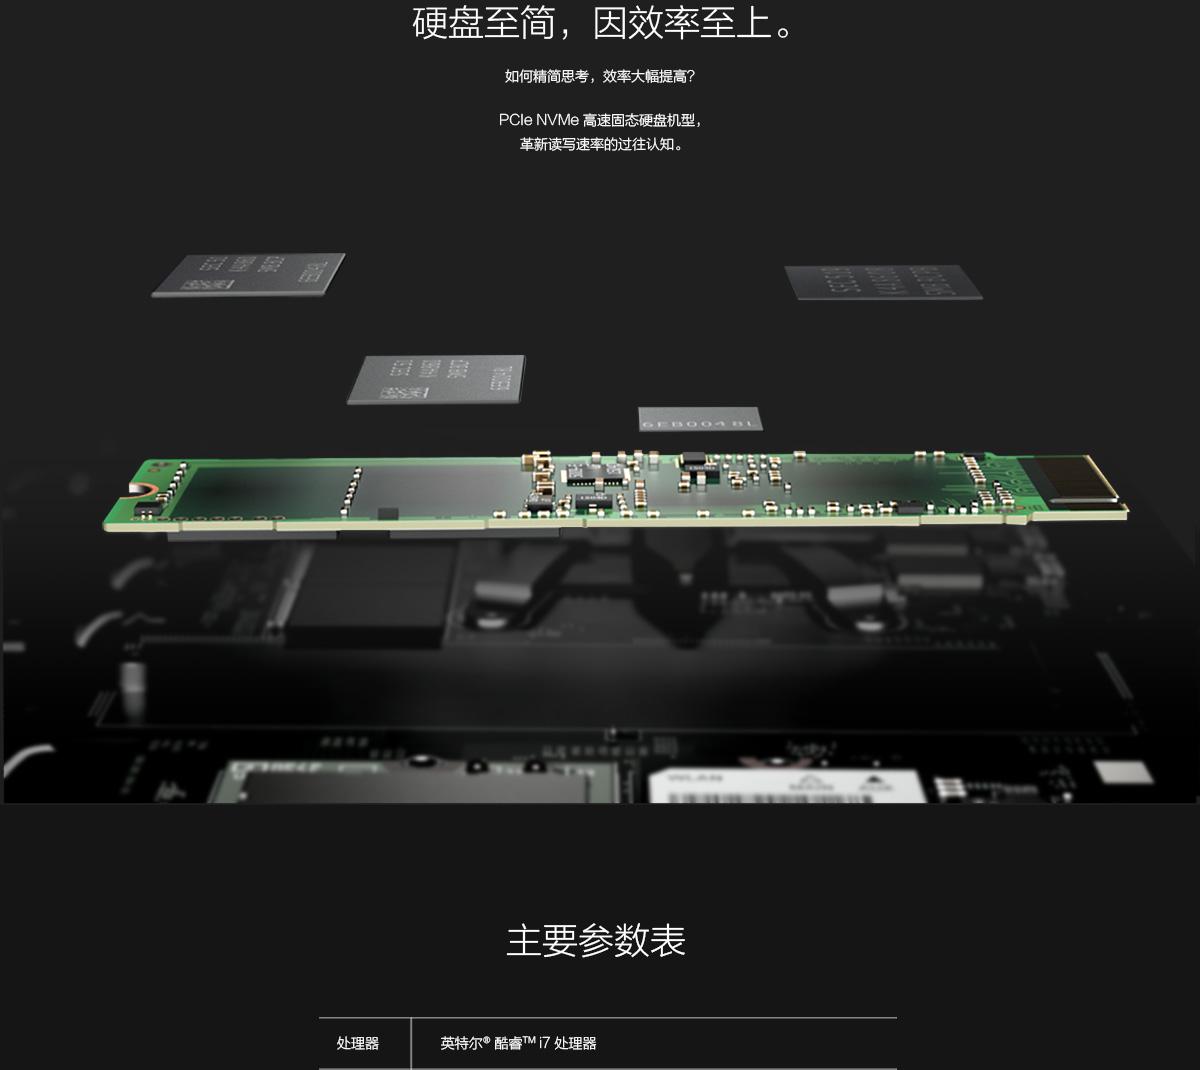 ThinkpadX1 Carbon 2017 银色版(PC)4